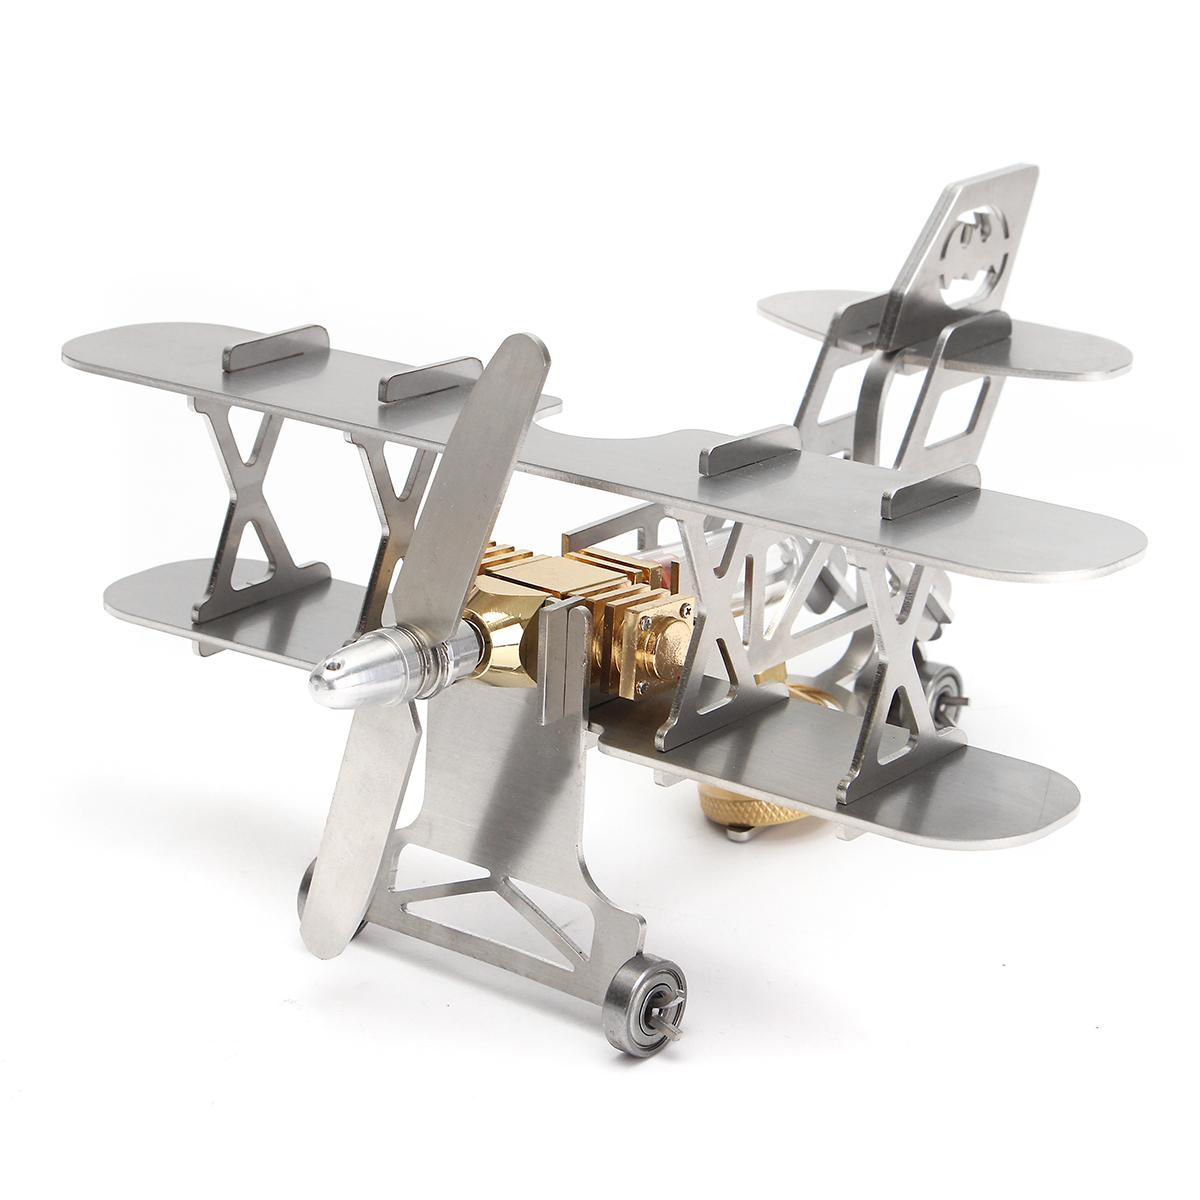 Aircraft Engine Stirling Engine Plane Motor Power Generator Model Piston Motor